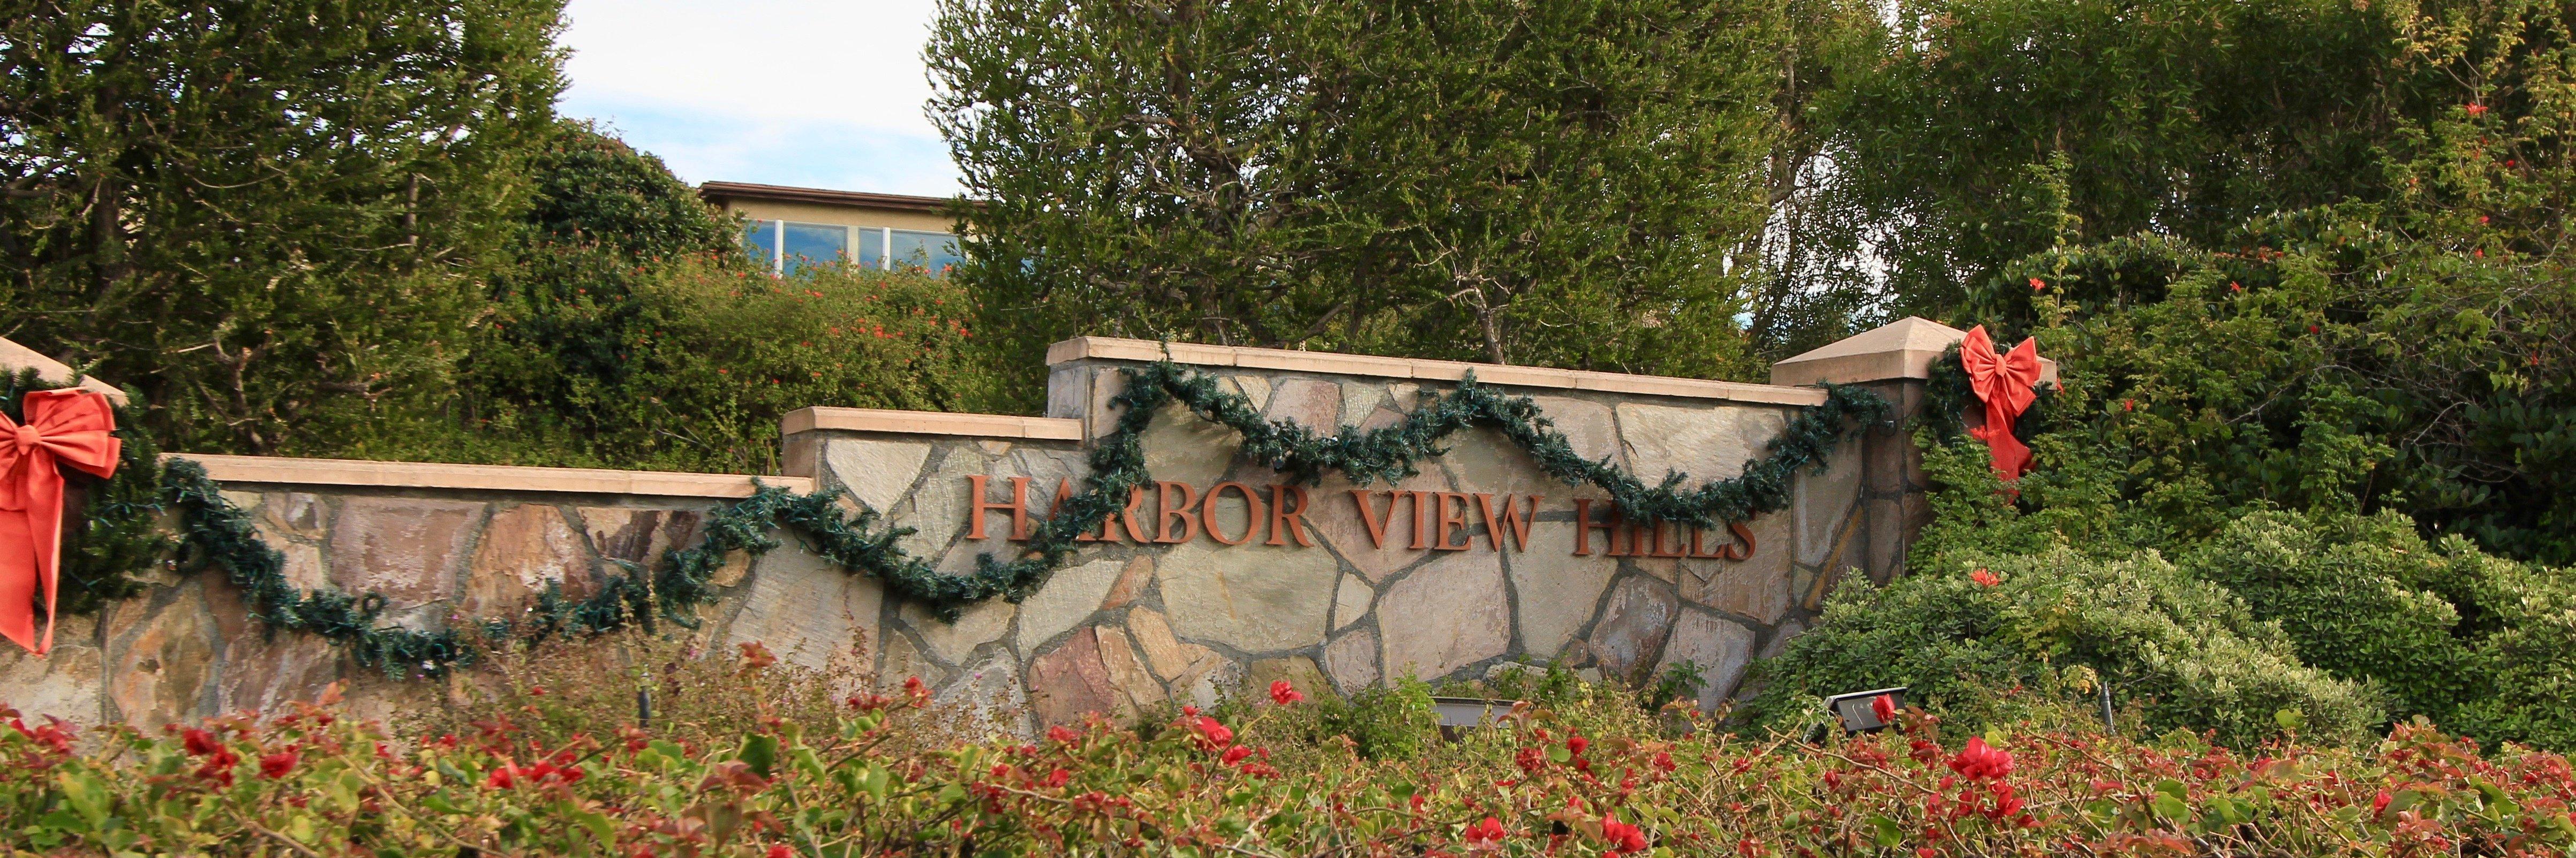 Harbor View Hills  is a custom home community in the hills of Corona Del Mar CA